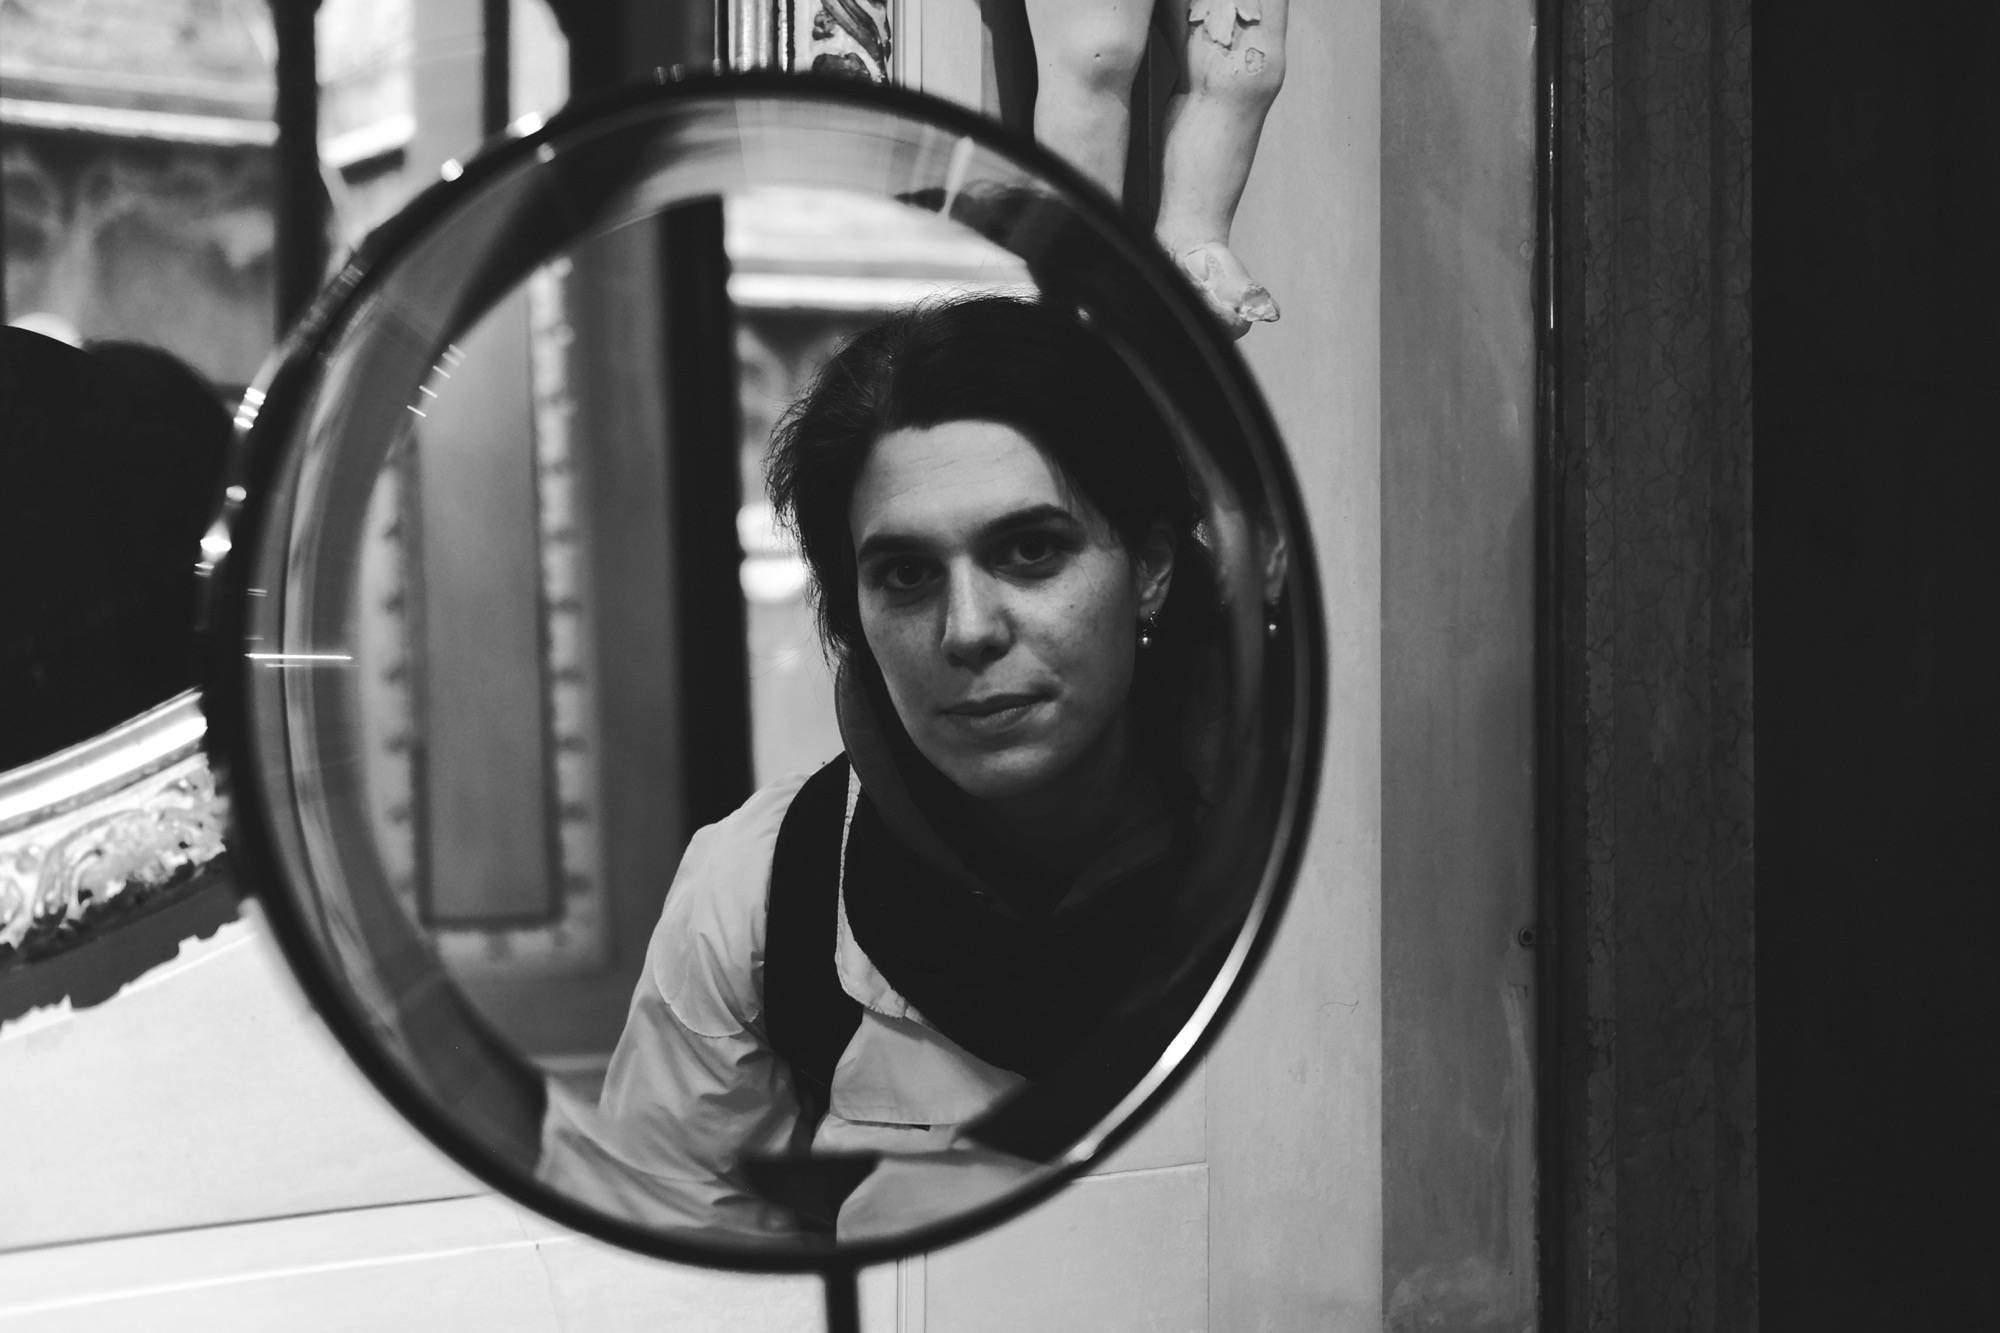 Massimiliano Scarpa photographer